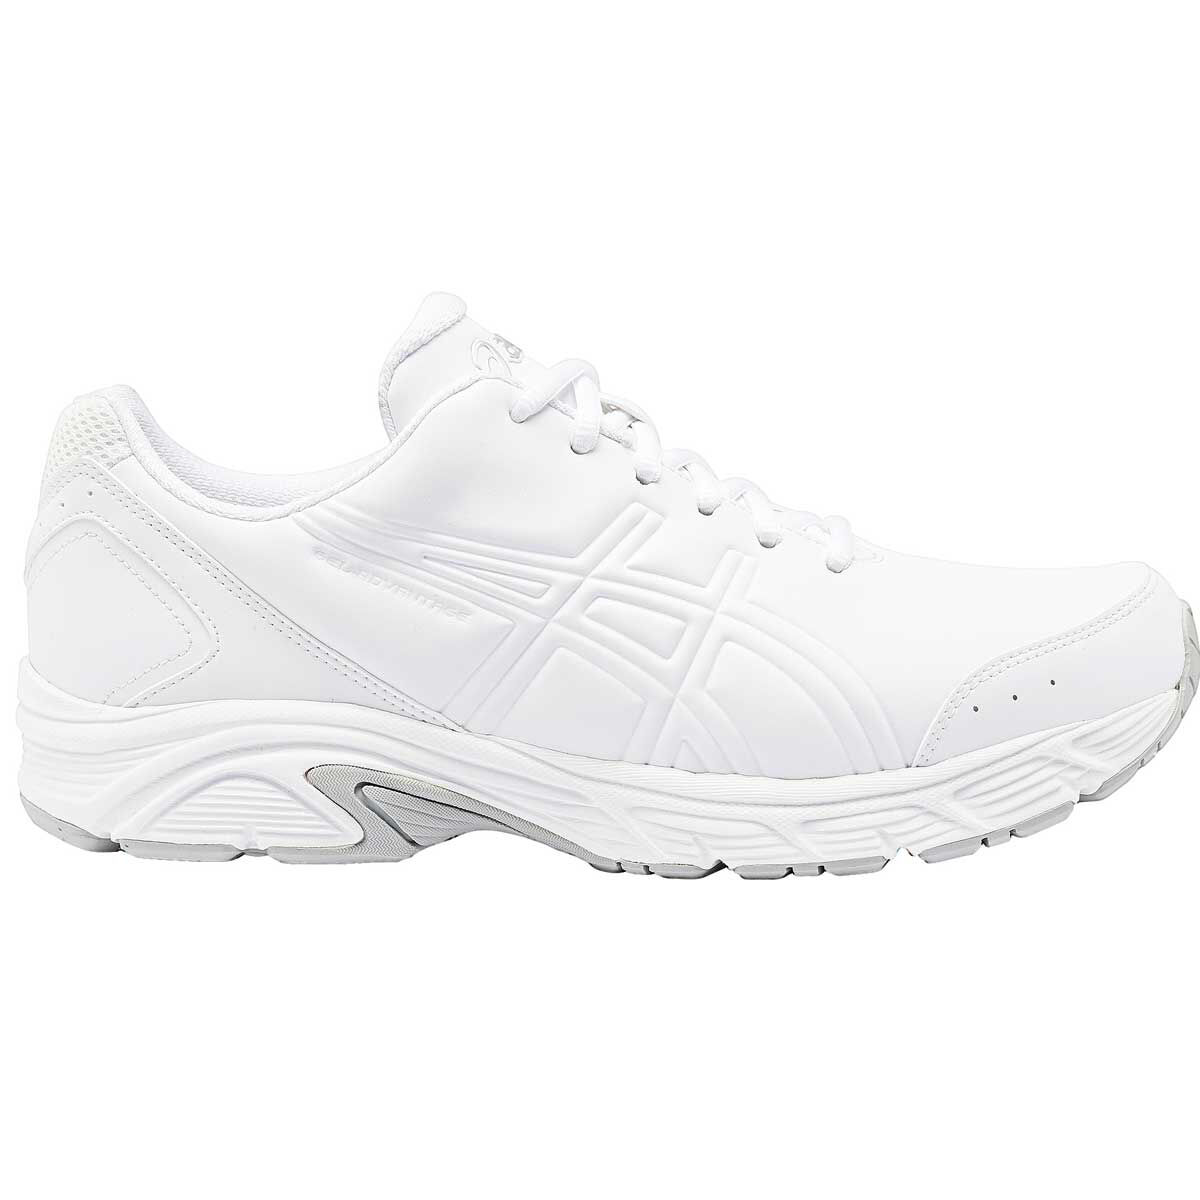 Asics Gel Advantage 3 Womens Walking Shoes White US 6